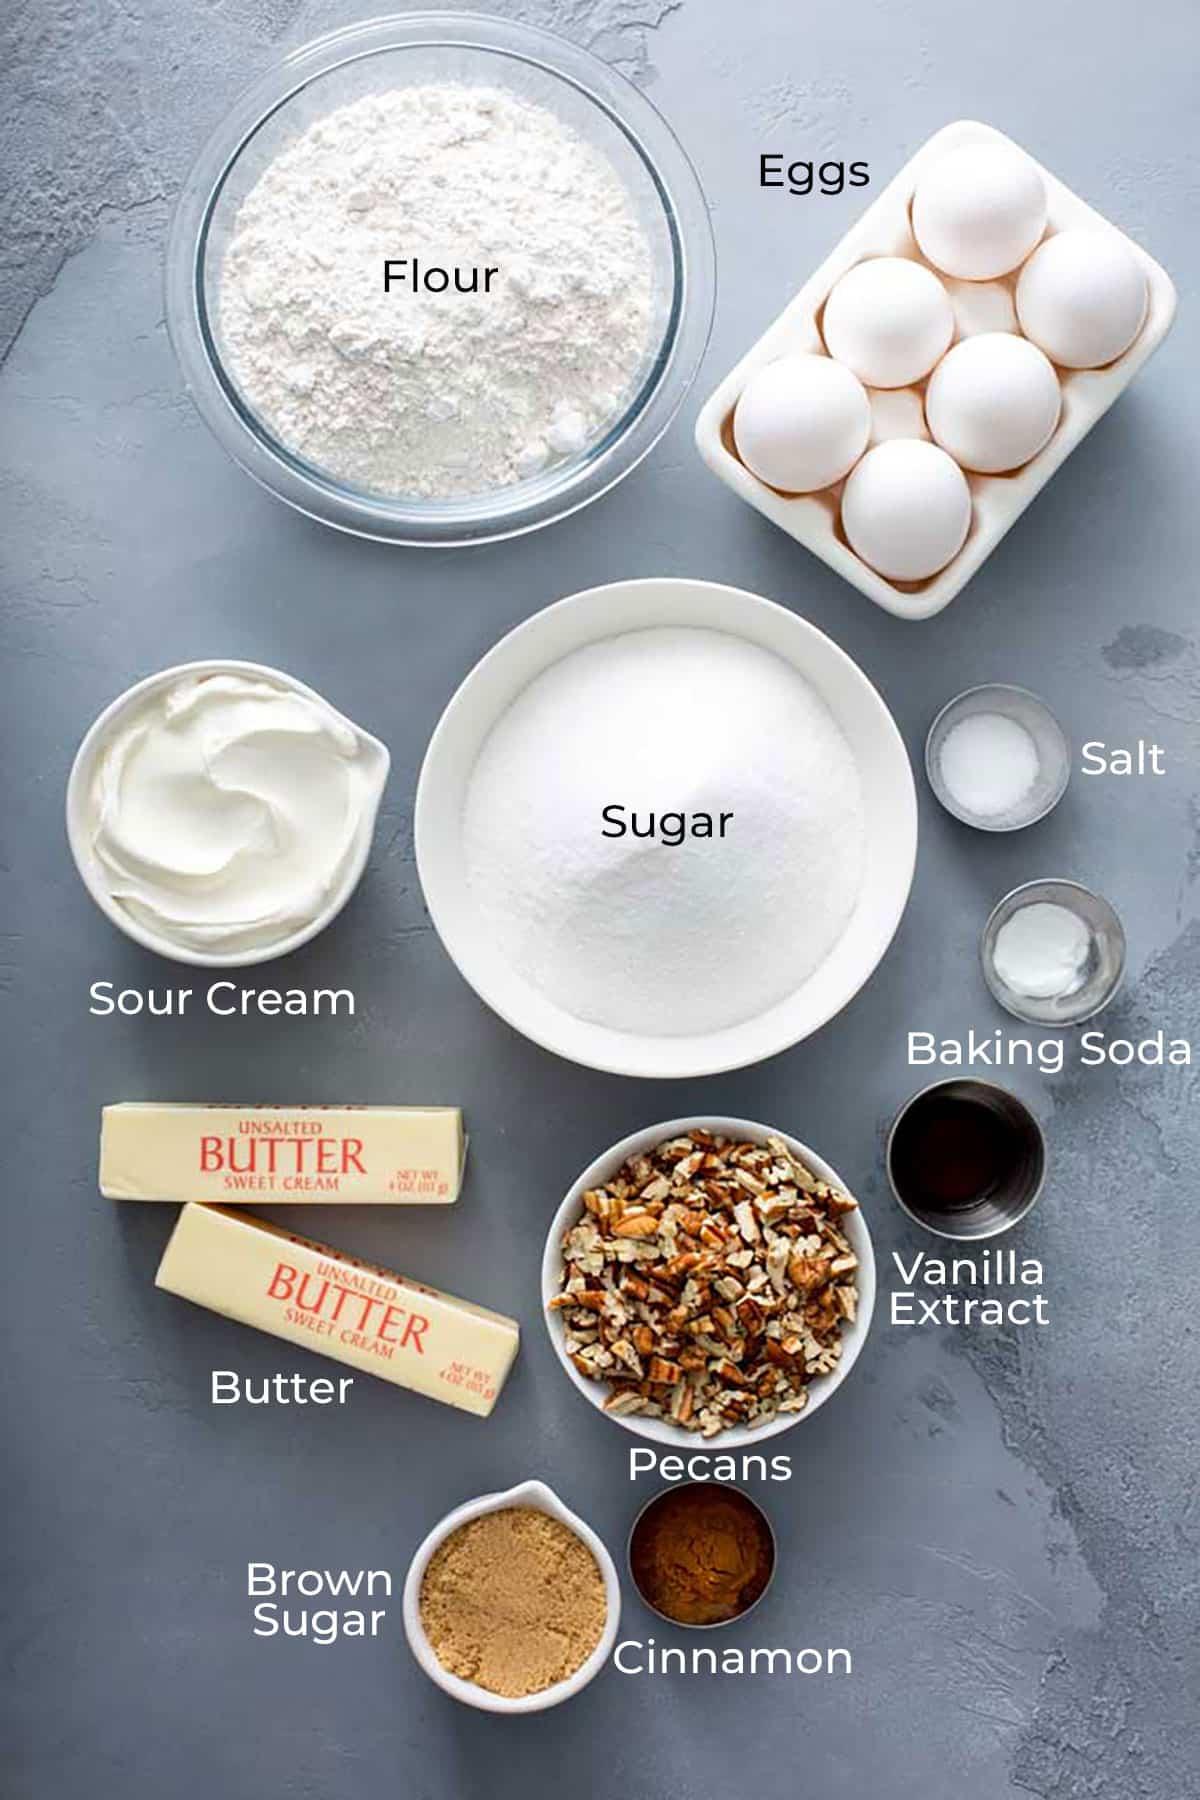 Ingredients to make Southern Retro Butter Bundt Cake